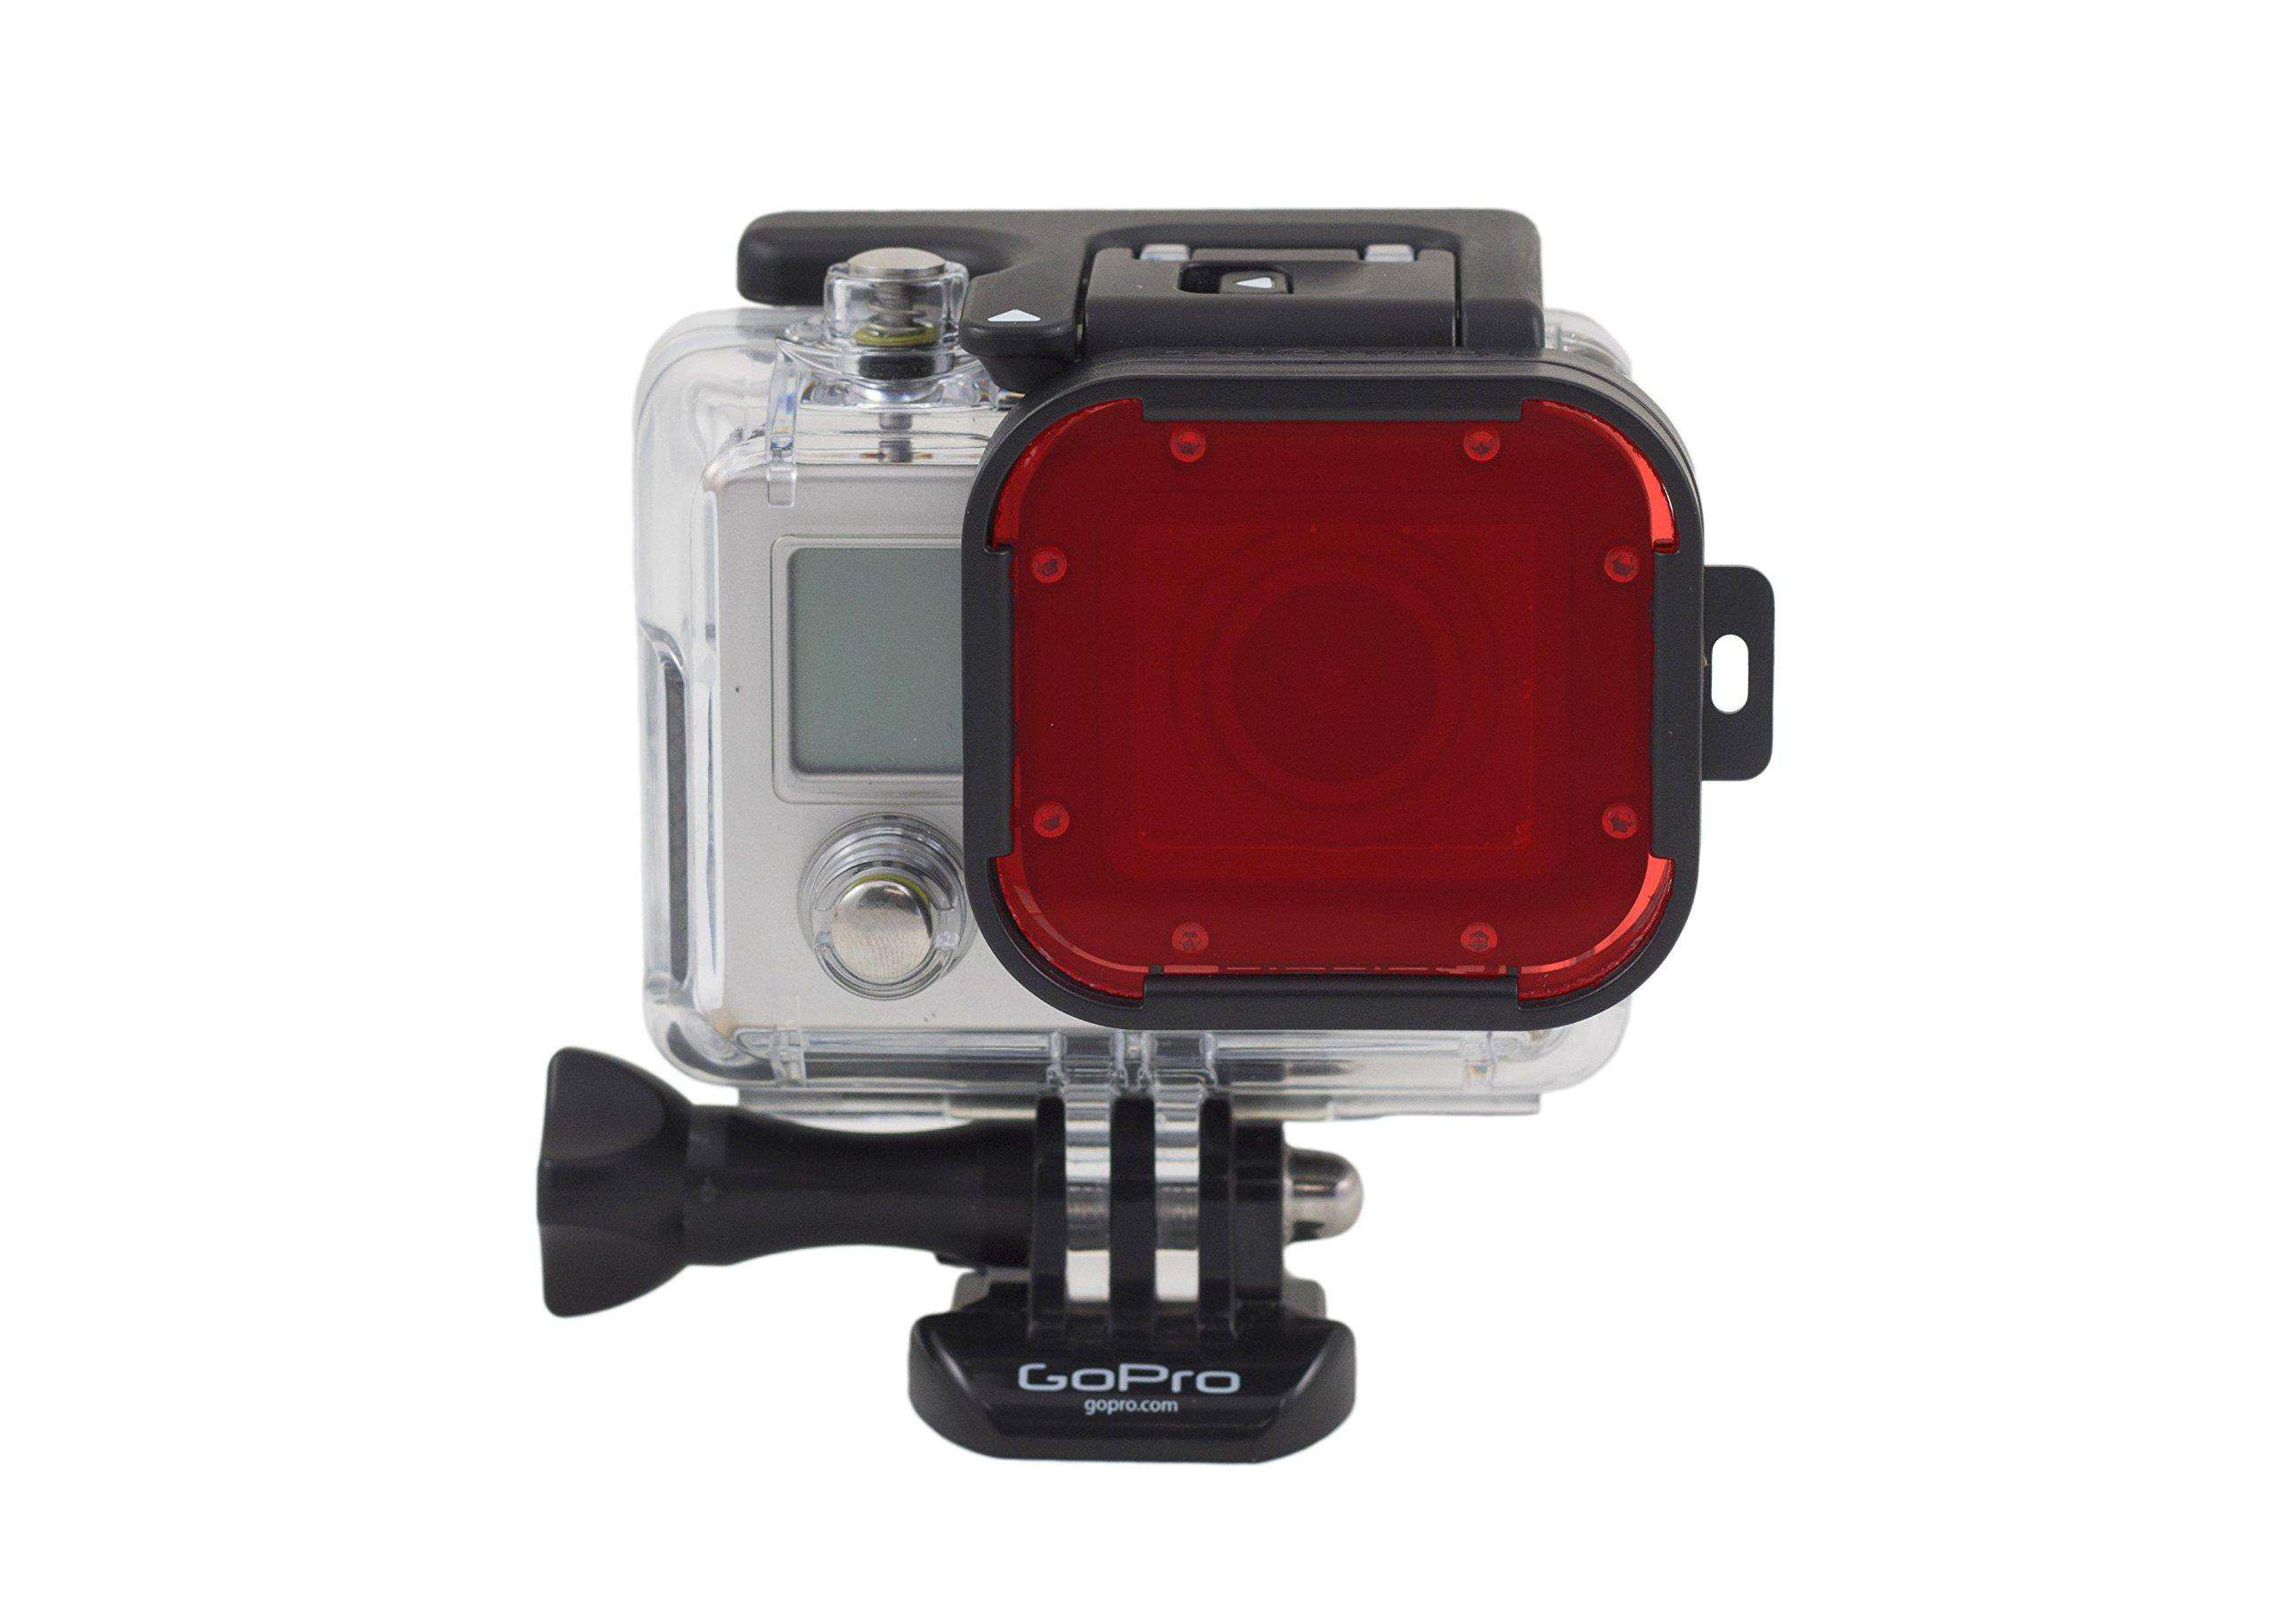 Polar Pro Red Filter-GoPro Hero3 Version-Acrylic Edition Accessory